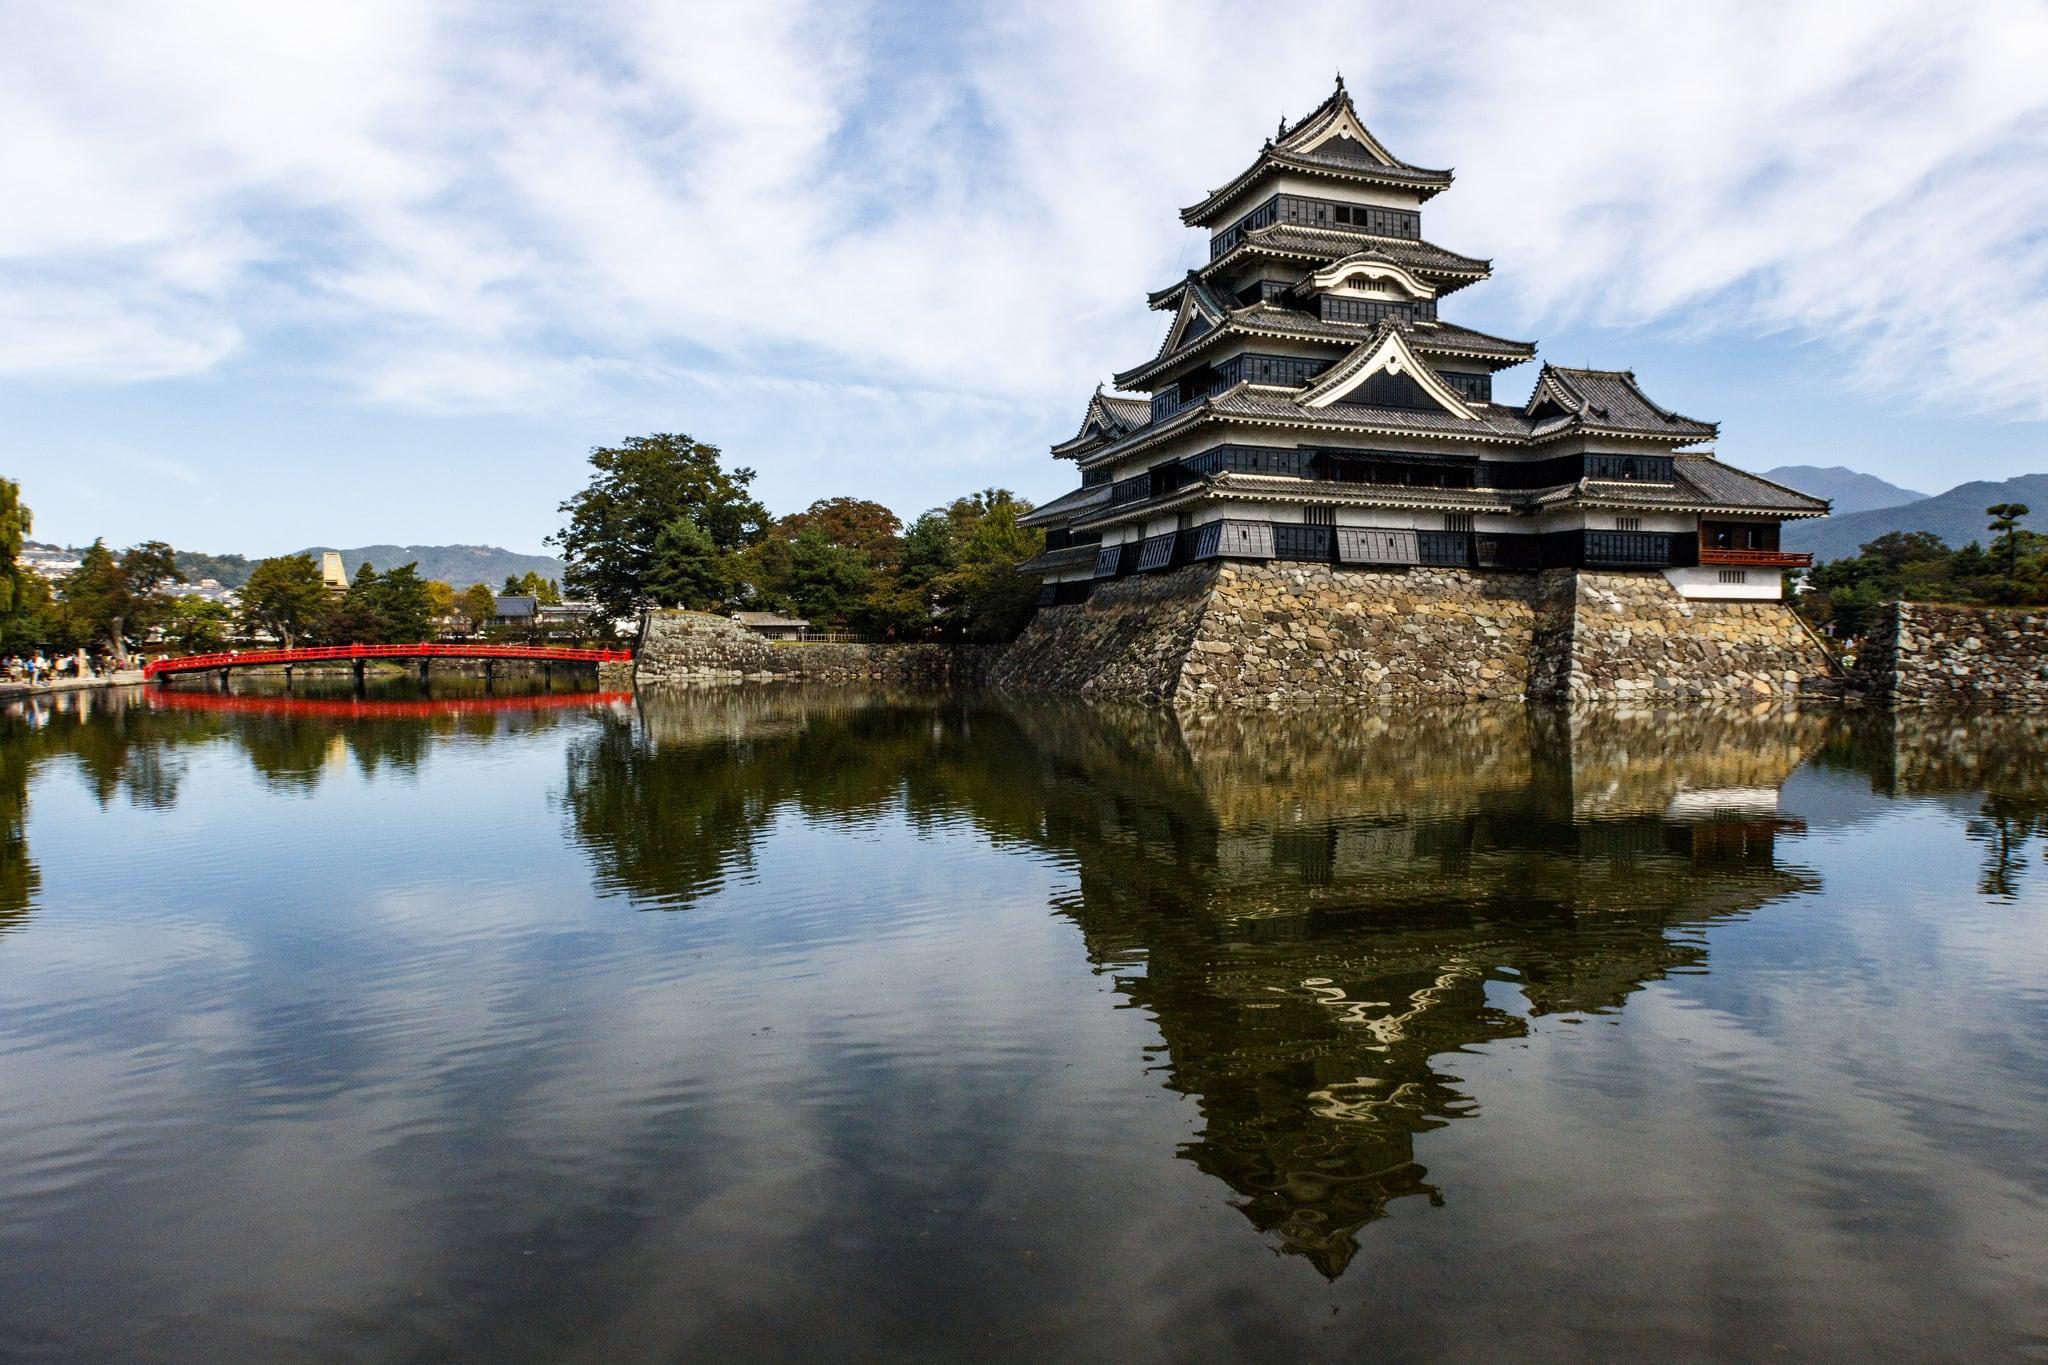 Matsumoto Castle 的形象. japan 2016 titan travel essence october 17 titantravel essenceofjapan canon 7d 7dii markii mark ii 2 sigma autumn